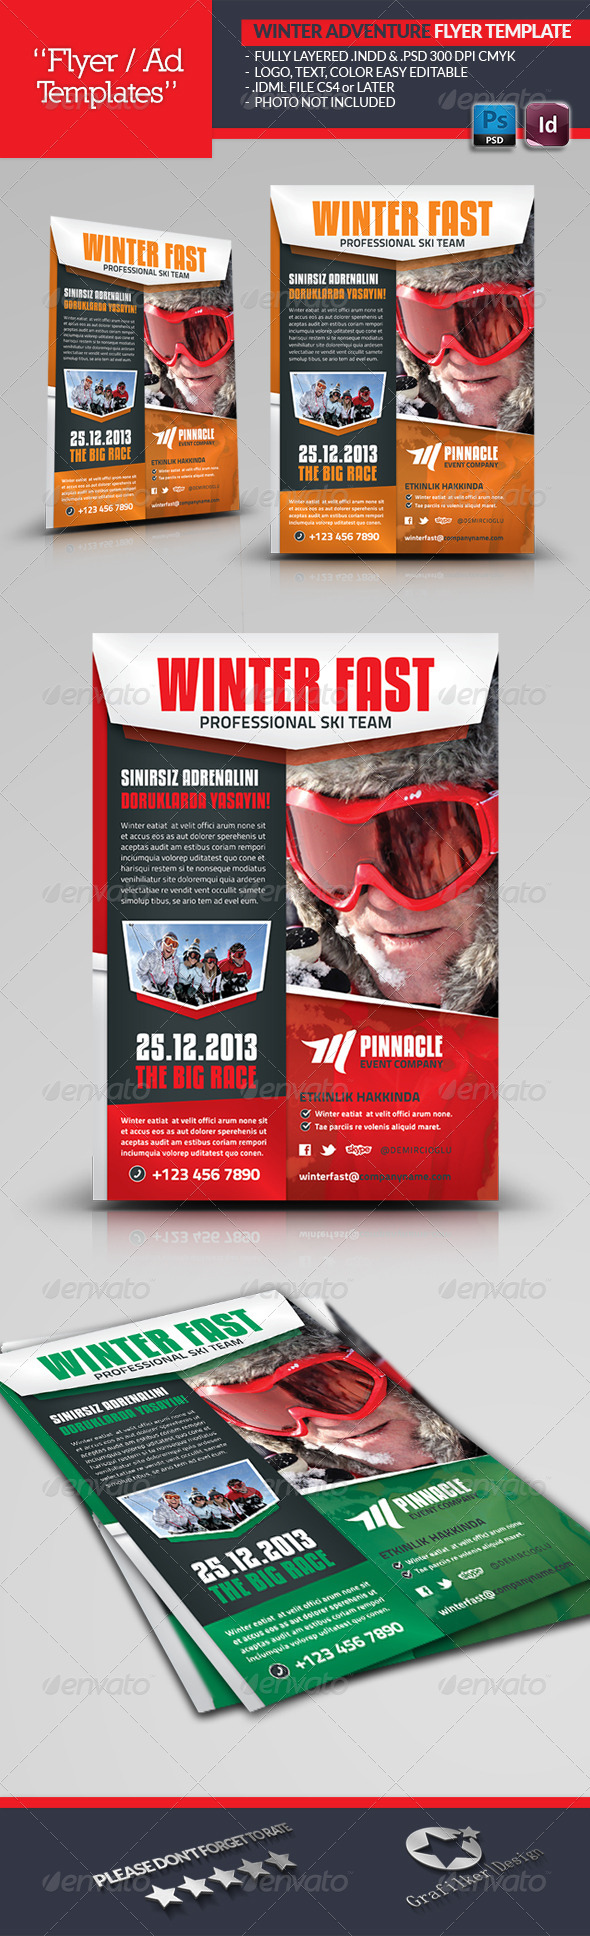 GraphicRiver Winter Adventure Flyer Template 6366433